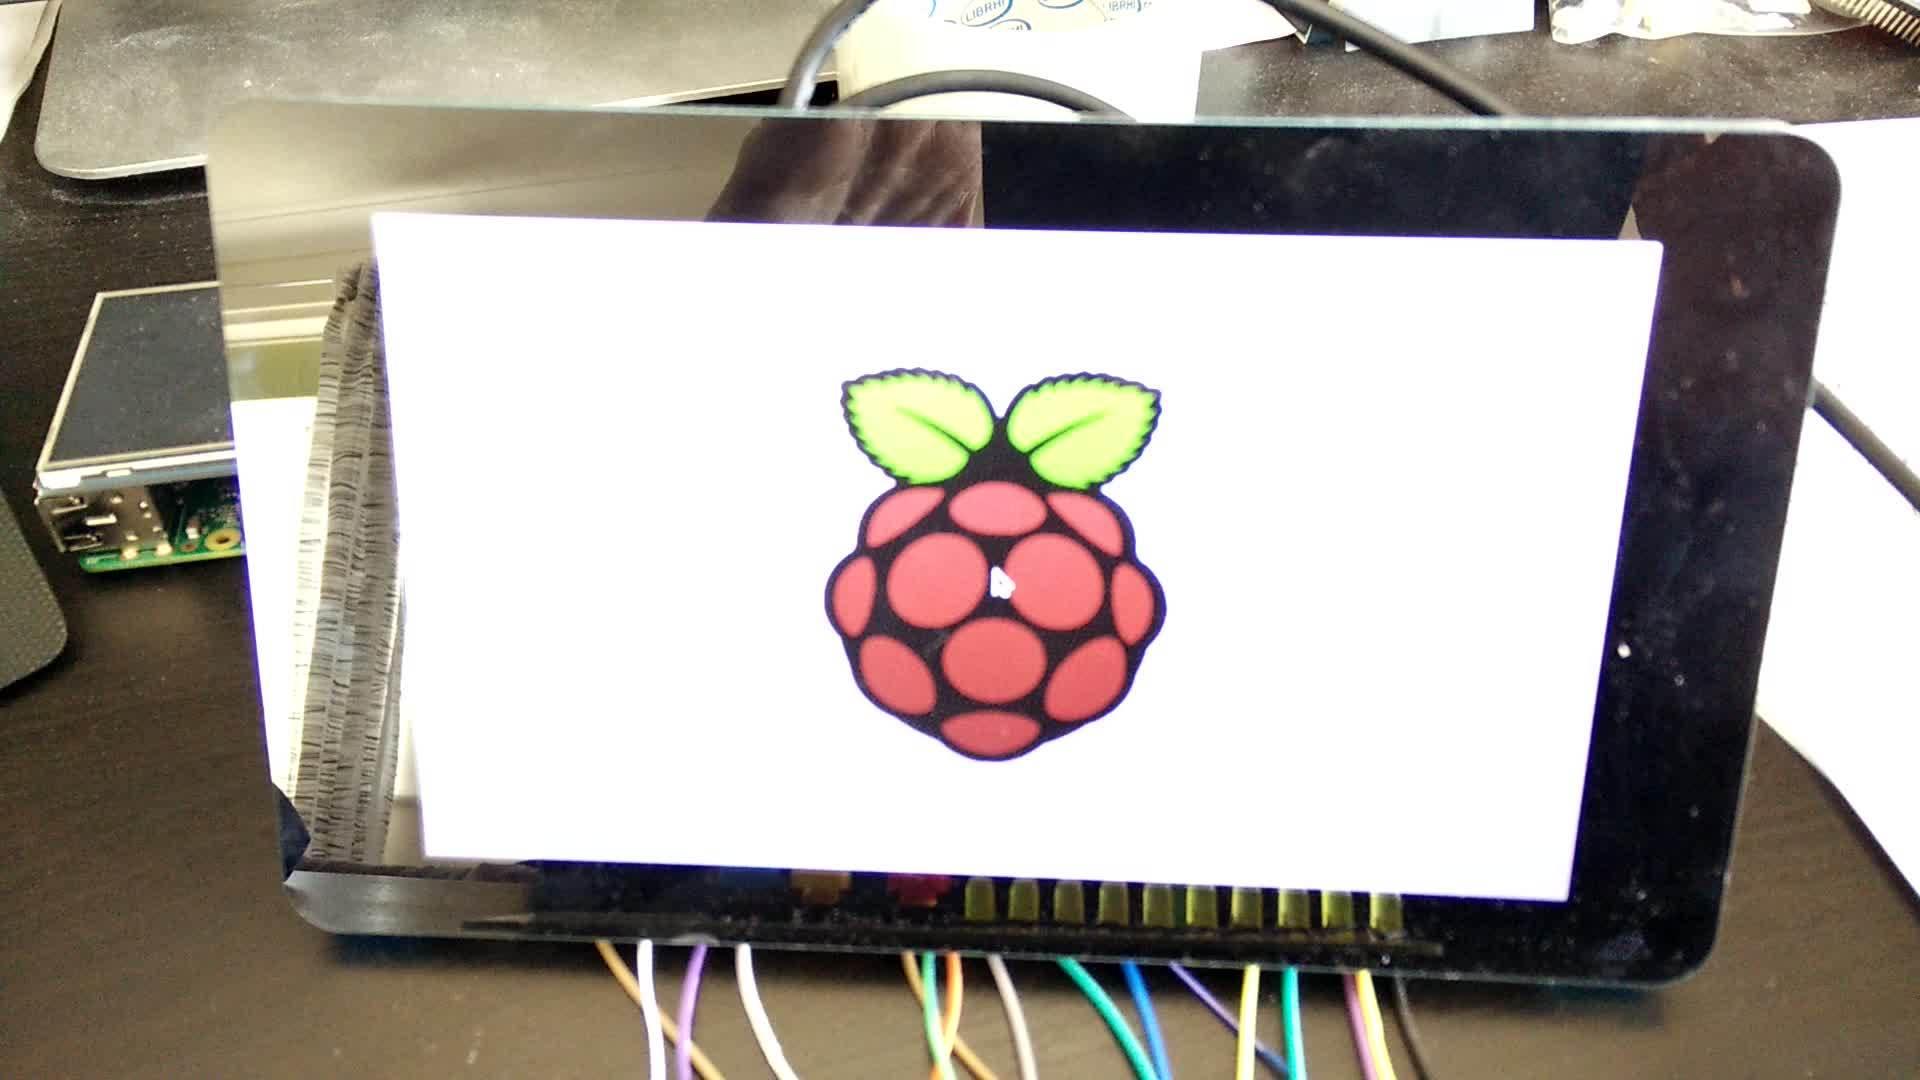 raspberry_pi, Raspberry Pi display glitch GIFs